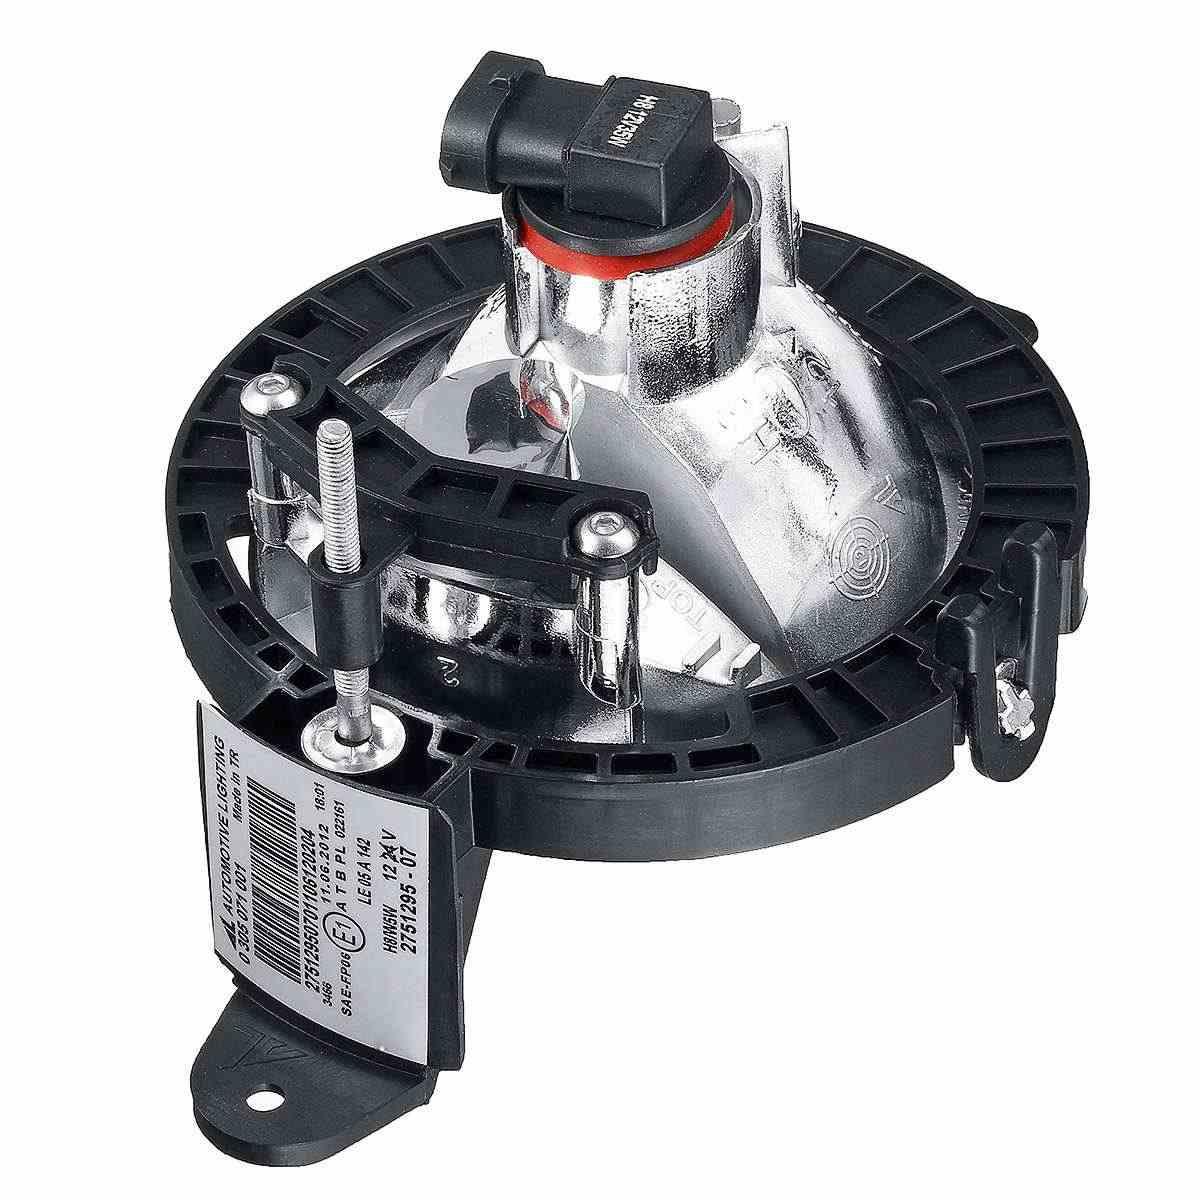 2x Kit de lampe antibrouillard avant pour BMW MINI COOPER R55 R56 R57 R58 R59 2006 ~ 2014